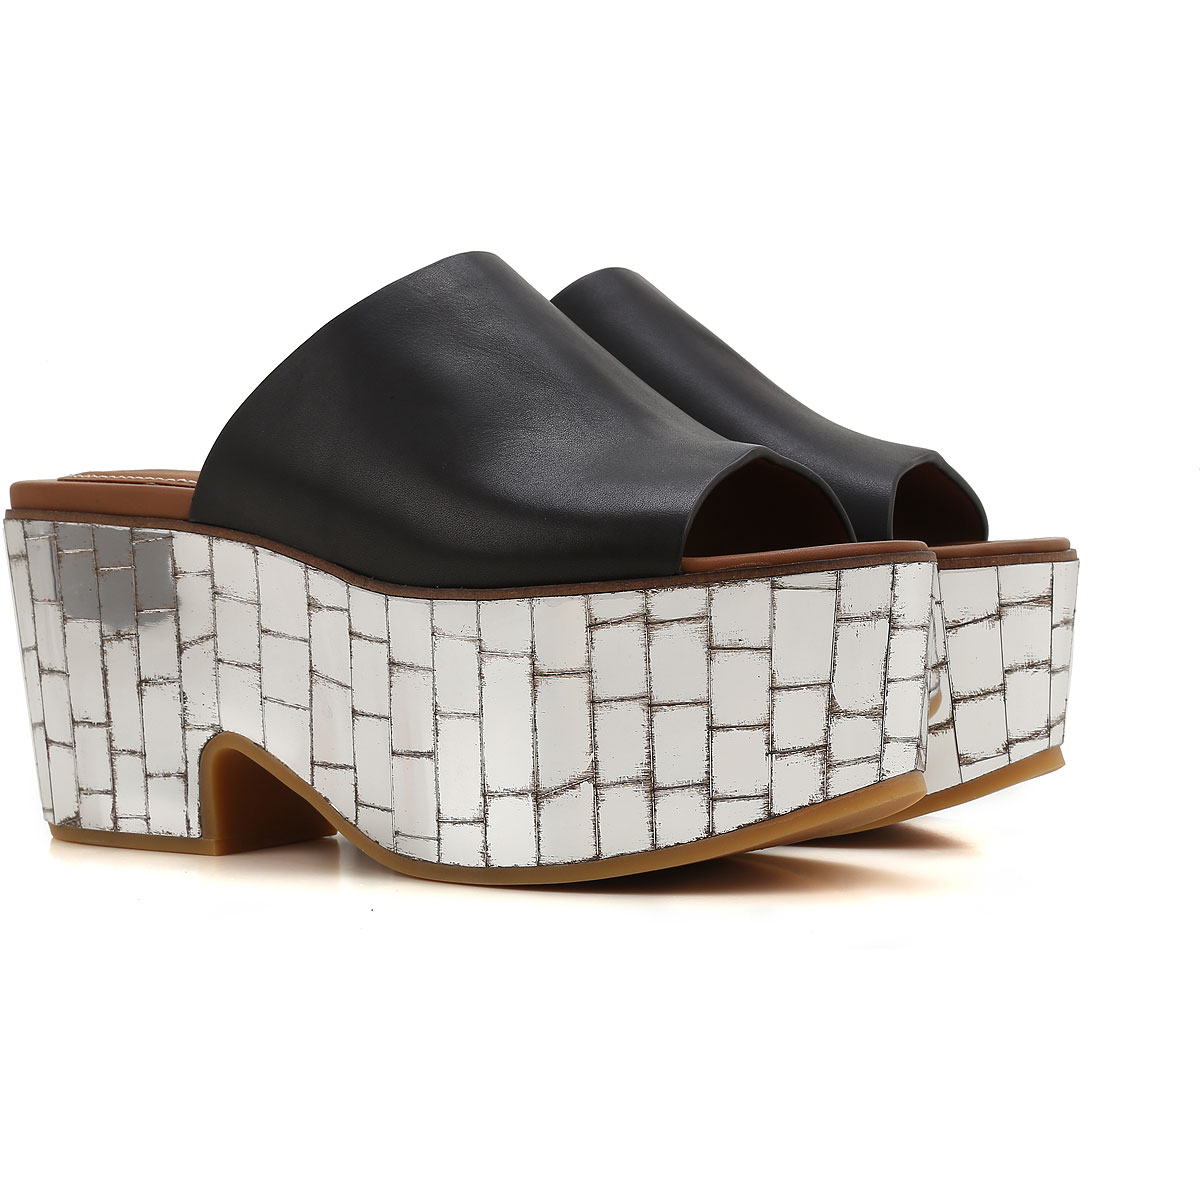 chaussures femme chlo code produit sb28006 5010 999. Black Bedroom Furniture Sets. Home Design Ideas